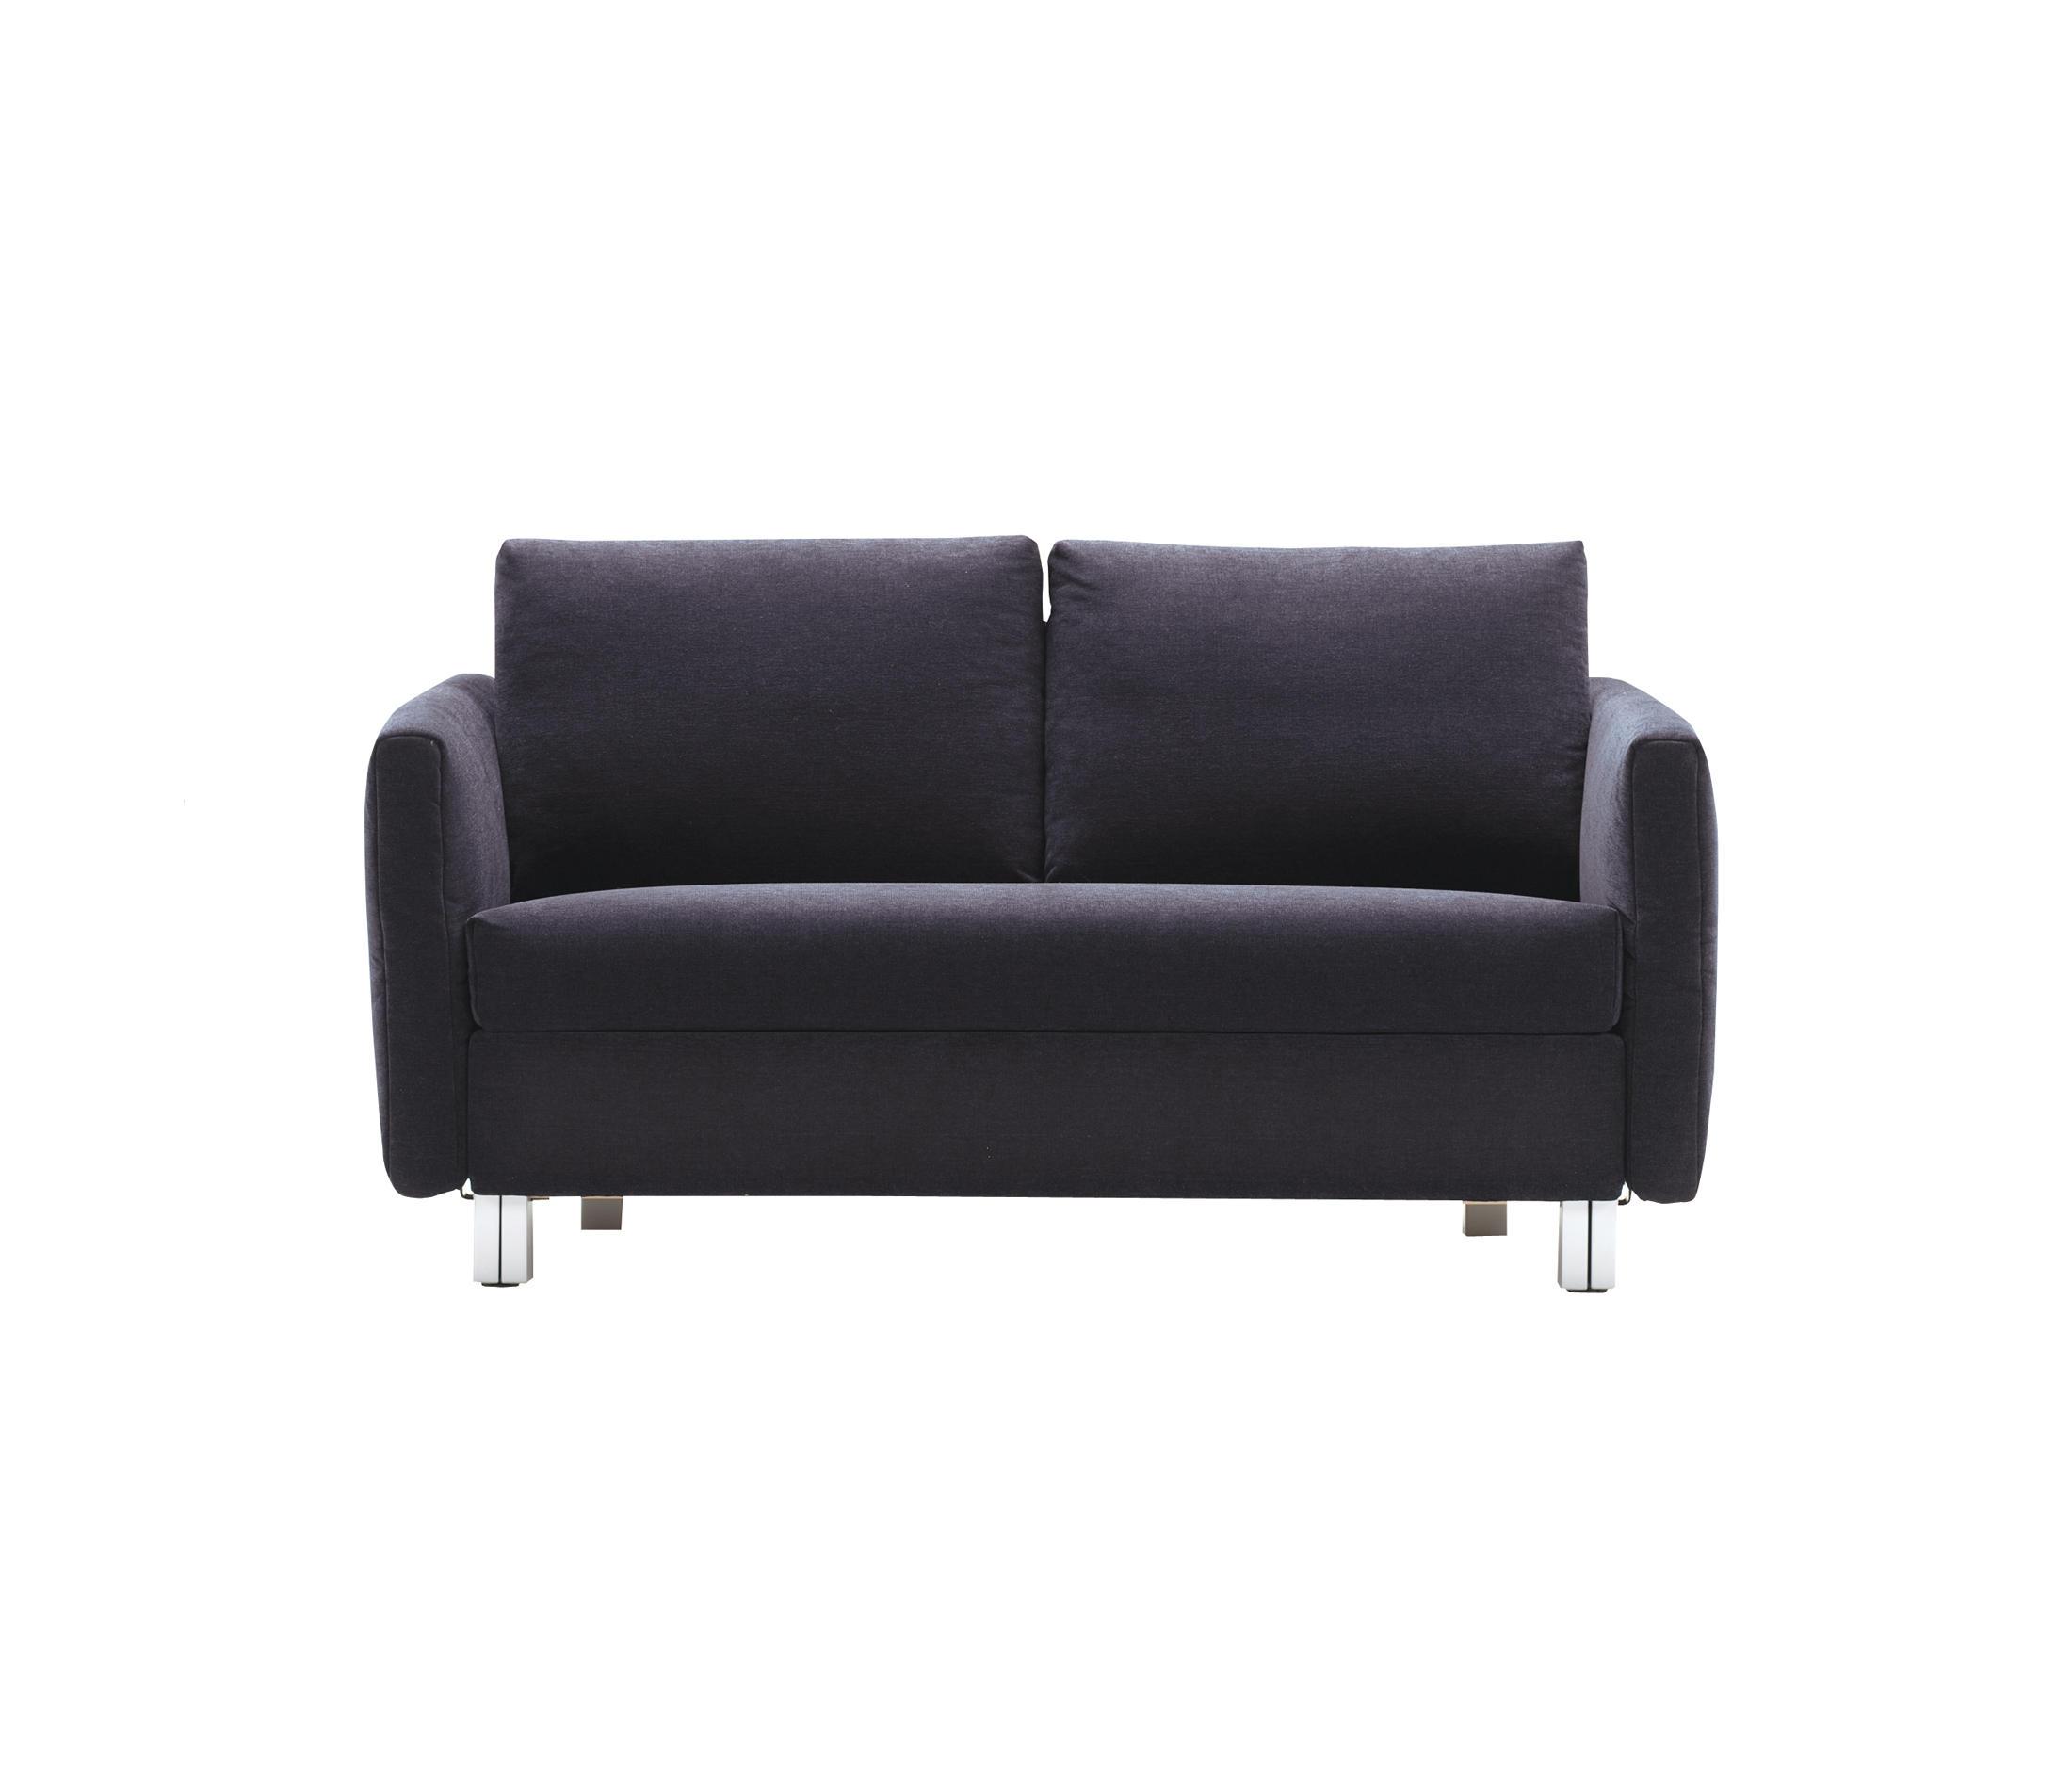 vela bettsofa schlafsofas von die collection architonic. Black Bedroom Furniture Sets. Home Design Ideas